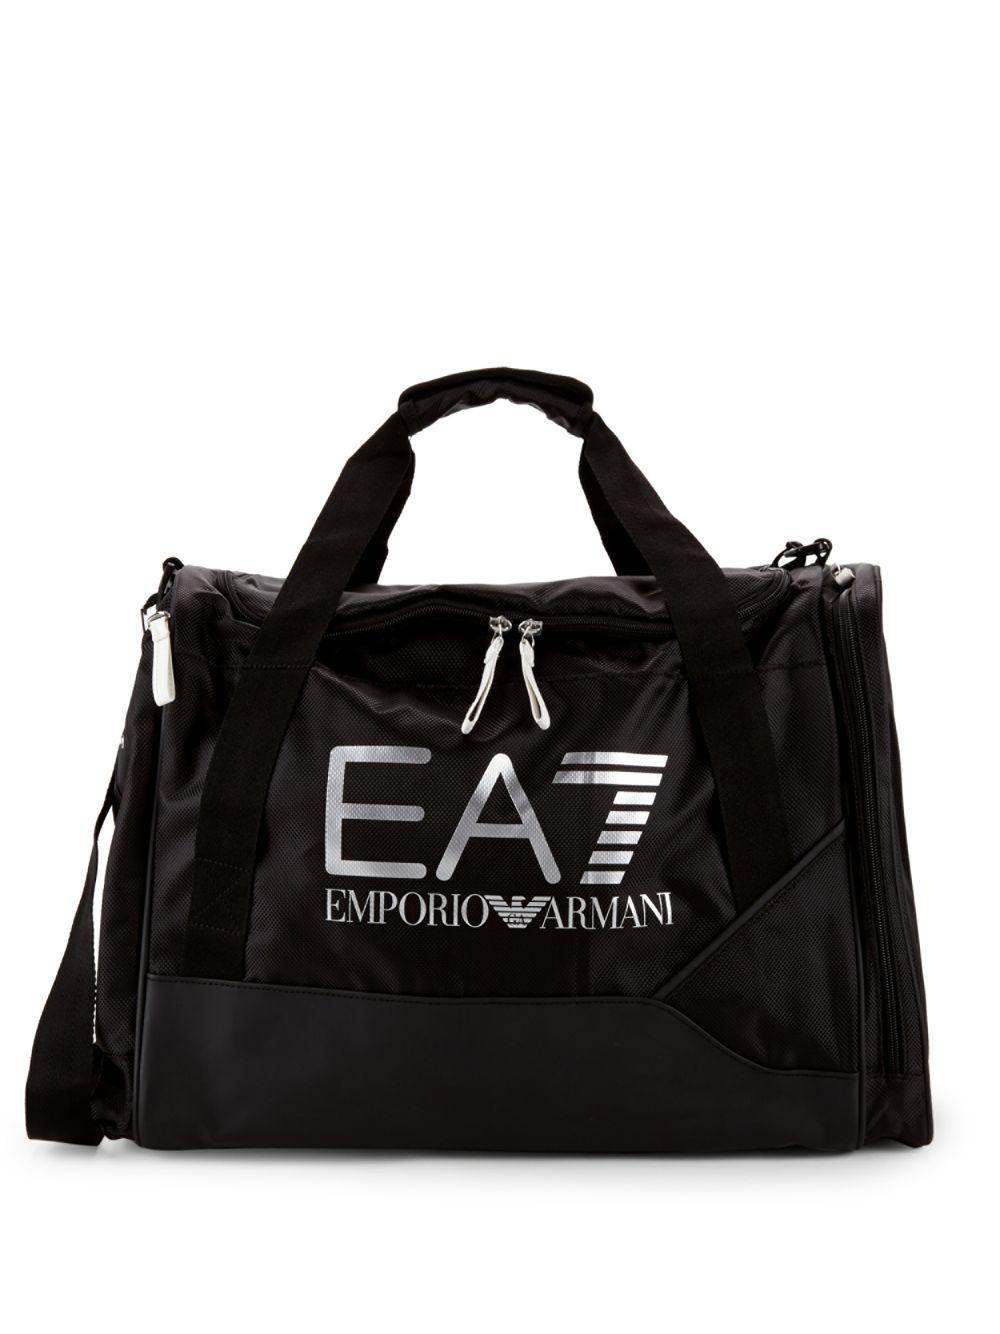 242559287cc3 Lyst - Emporio Armani Ea7 Duffle Bag in Black for Men